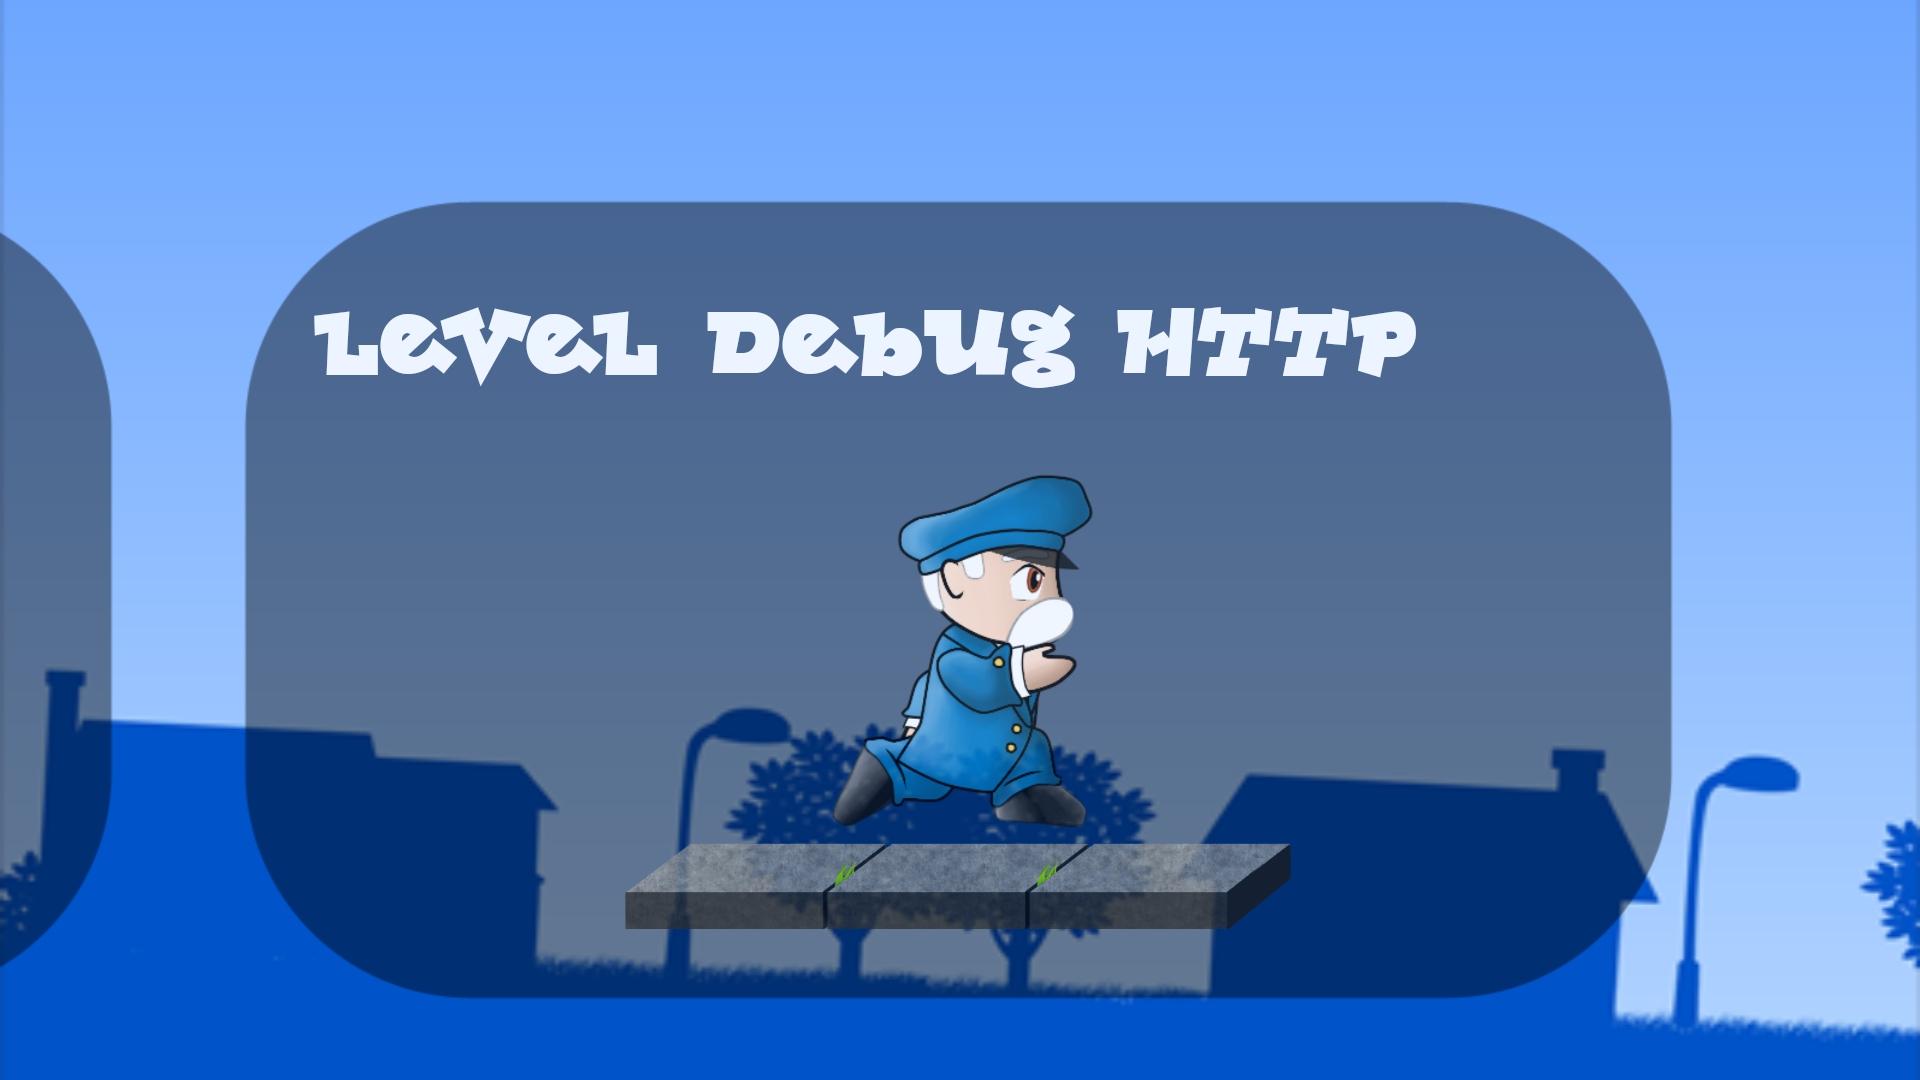 http_level